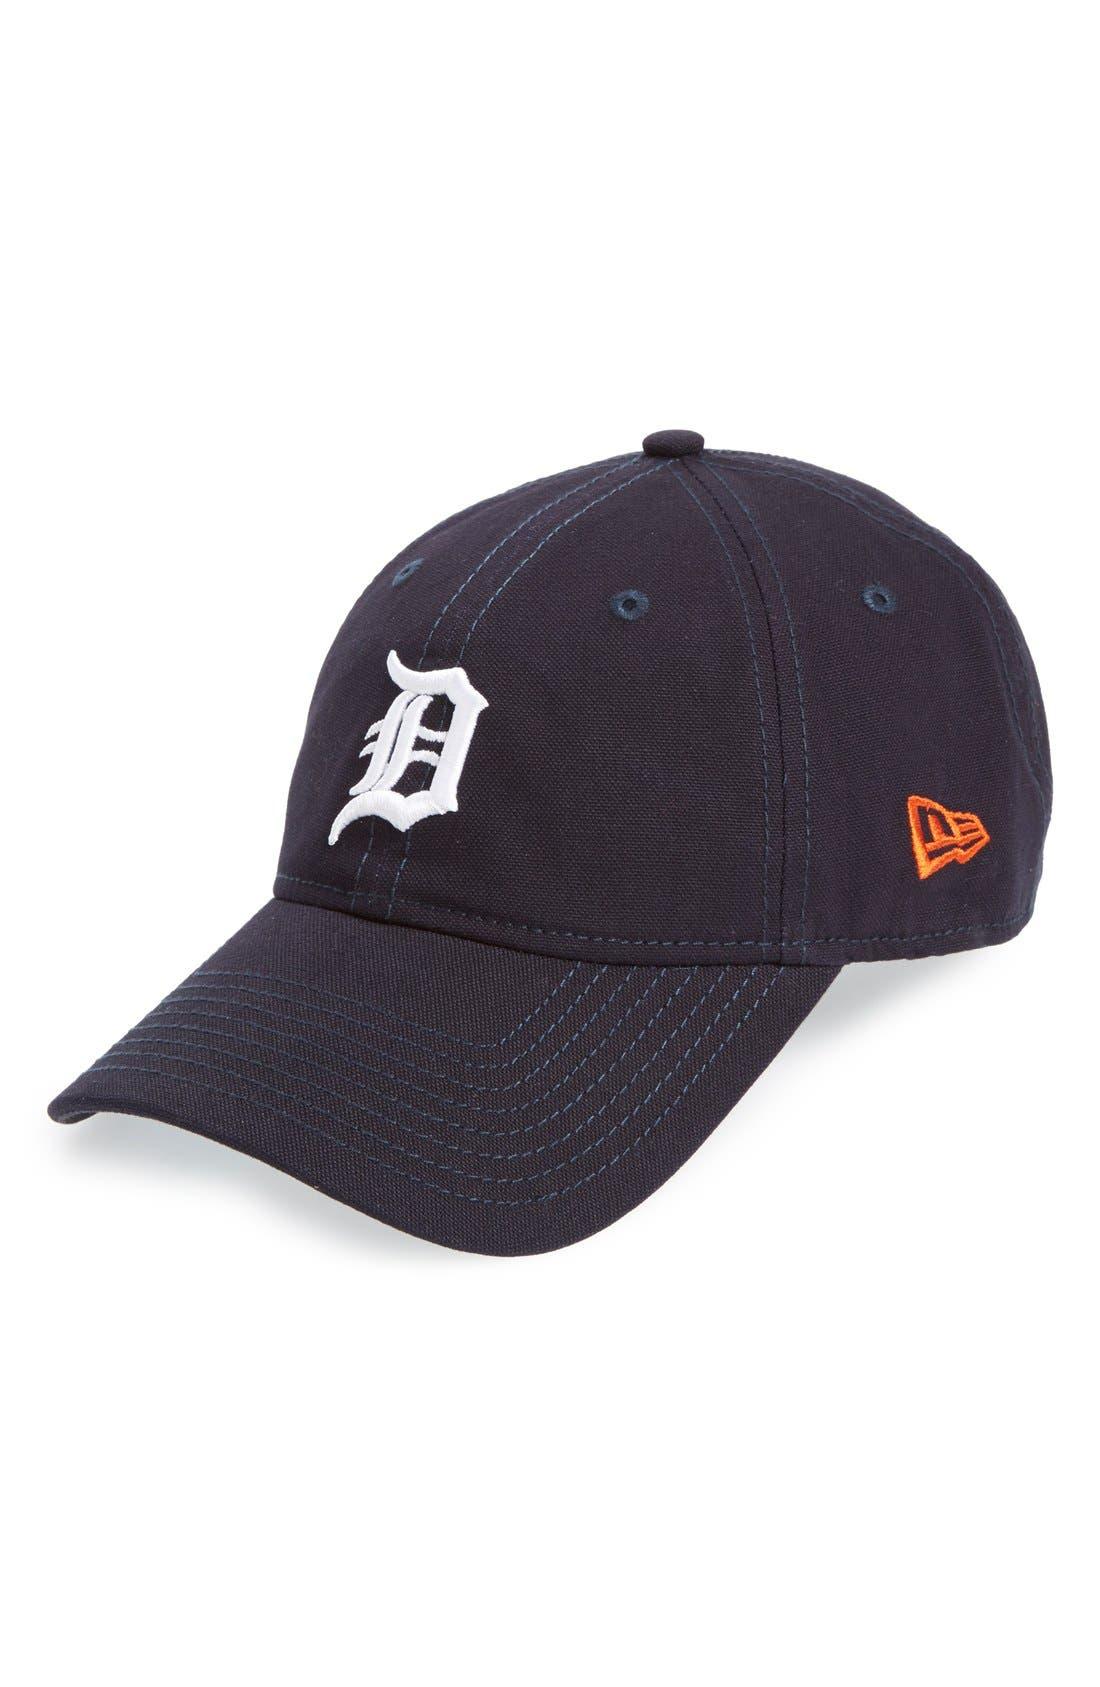 Main Image - New Era Cap 'Core Shore - Detroit Tigers' Baseball Cap